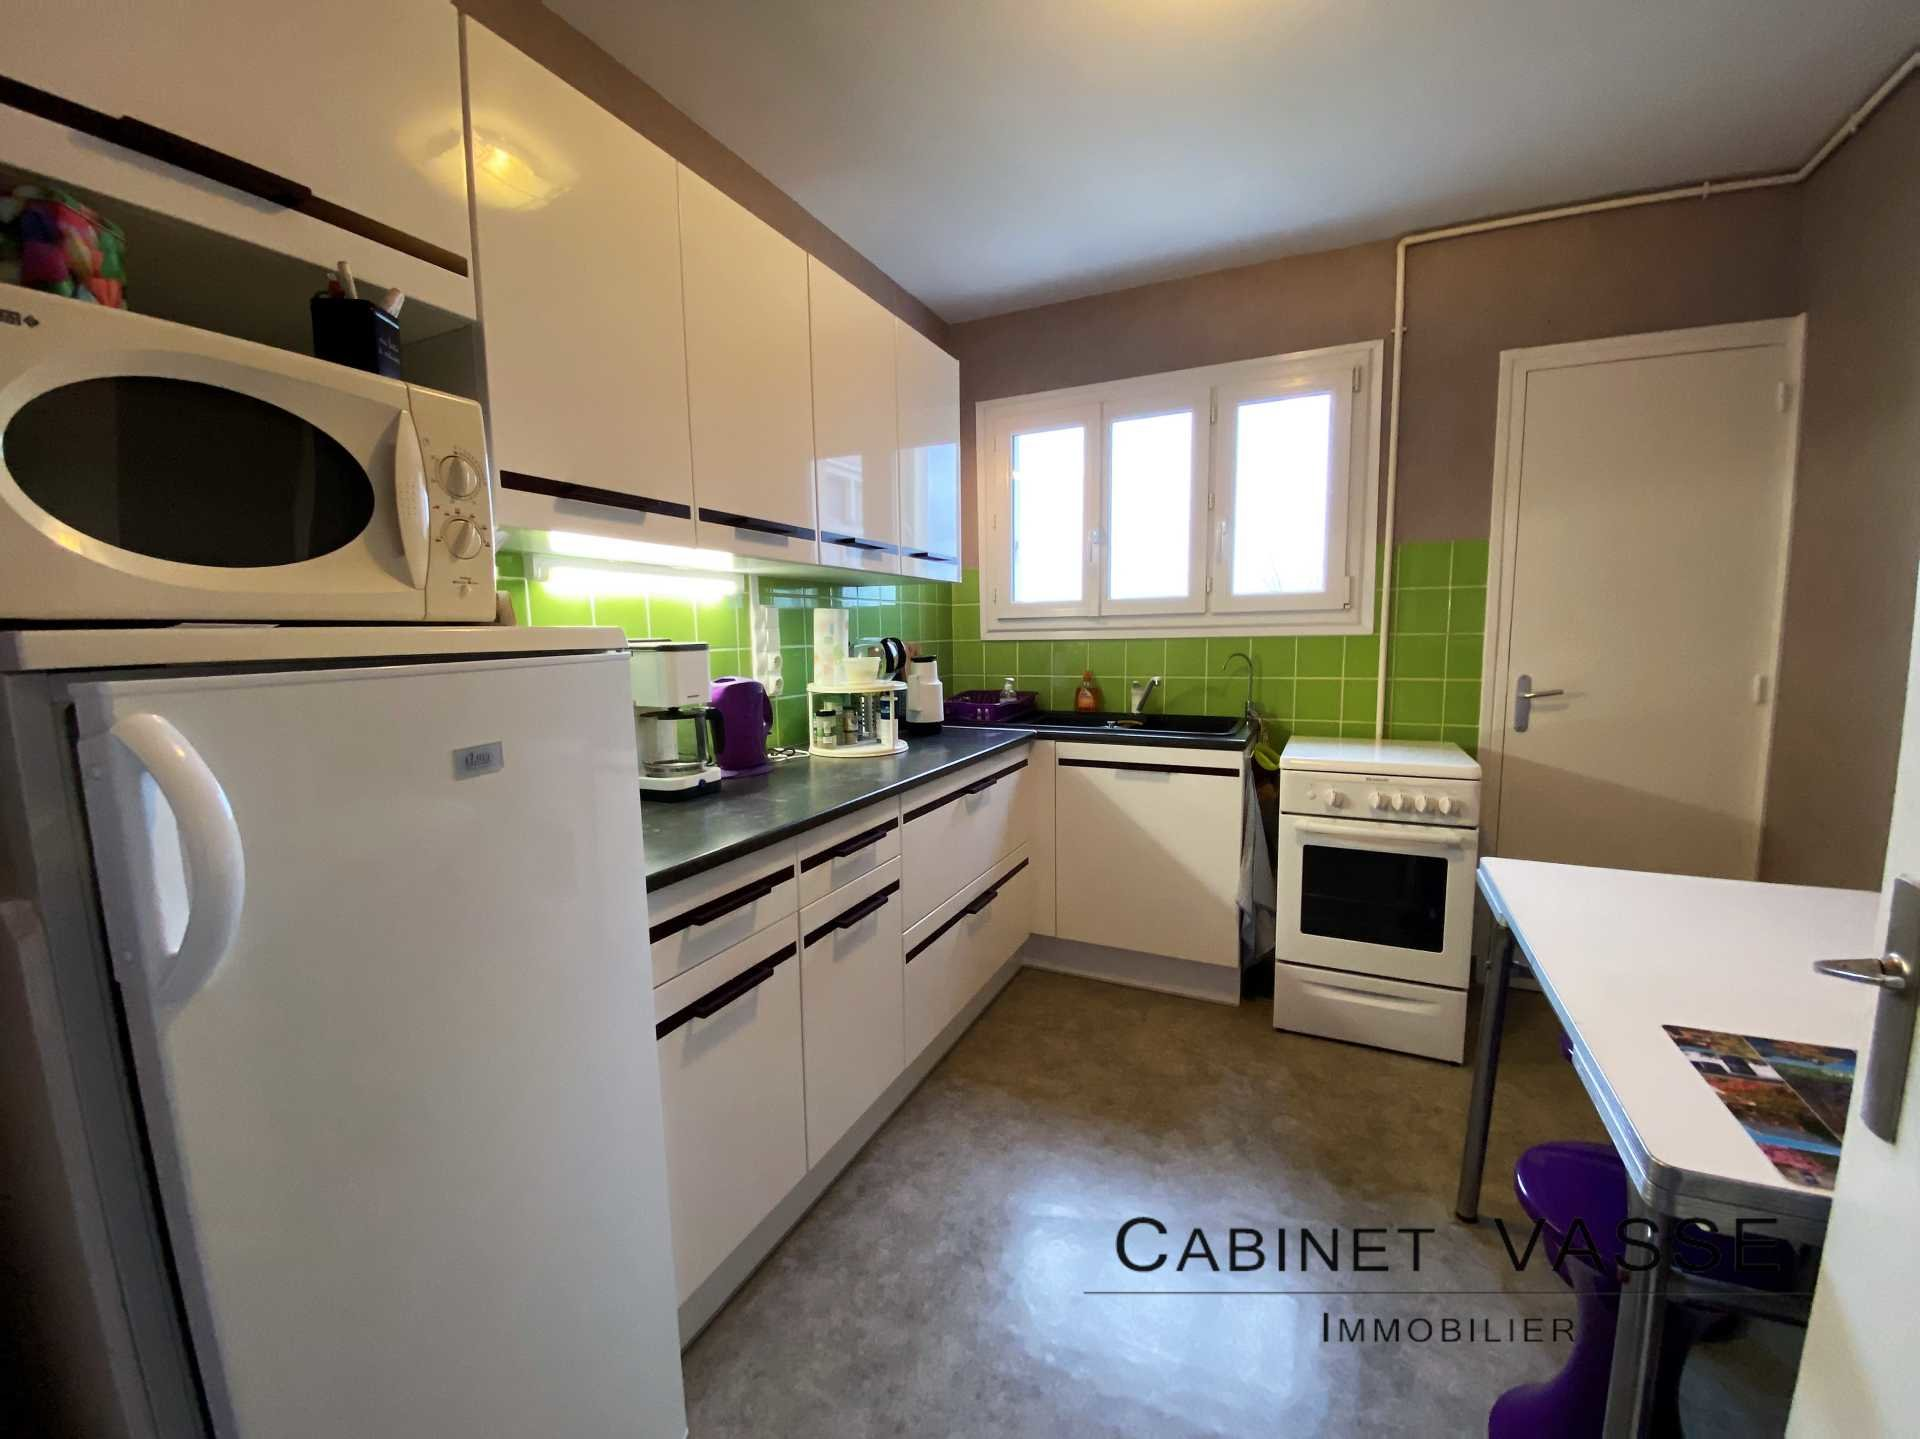 résidence, cuisine, aménagée, vasse, a vendre